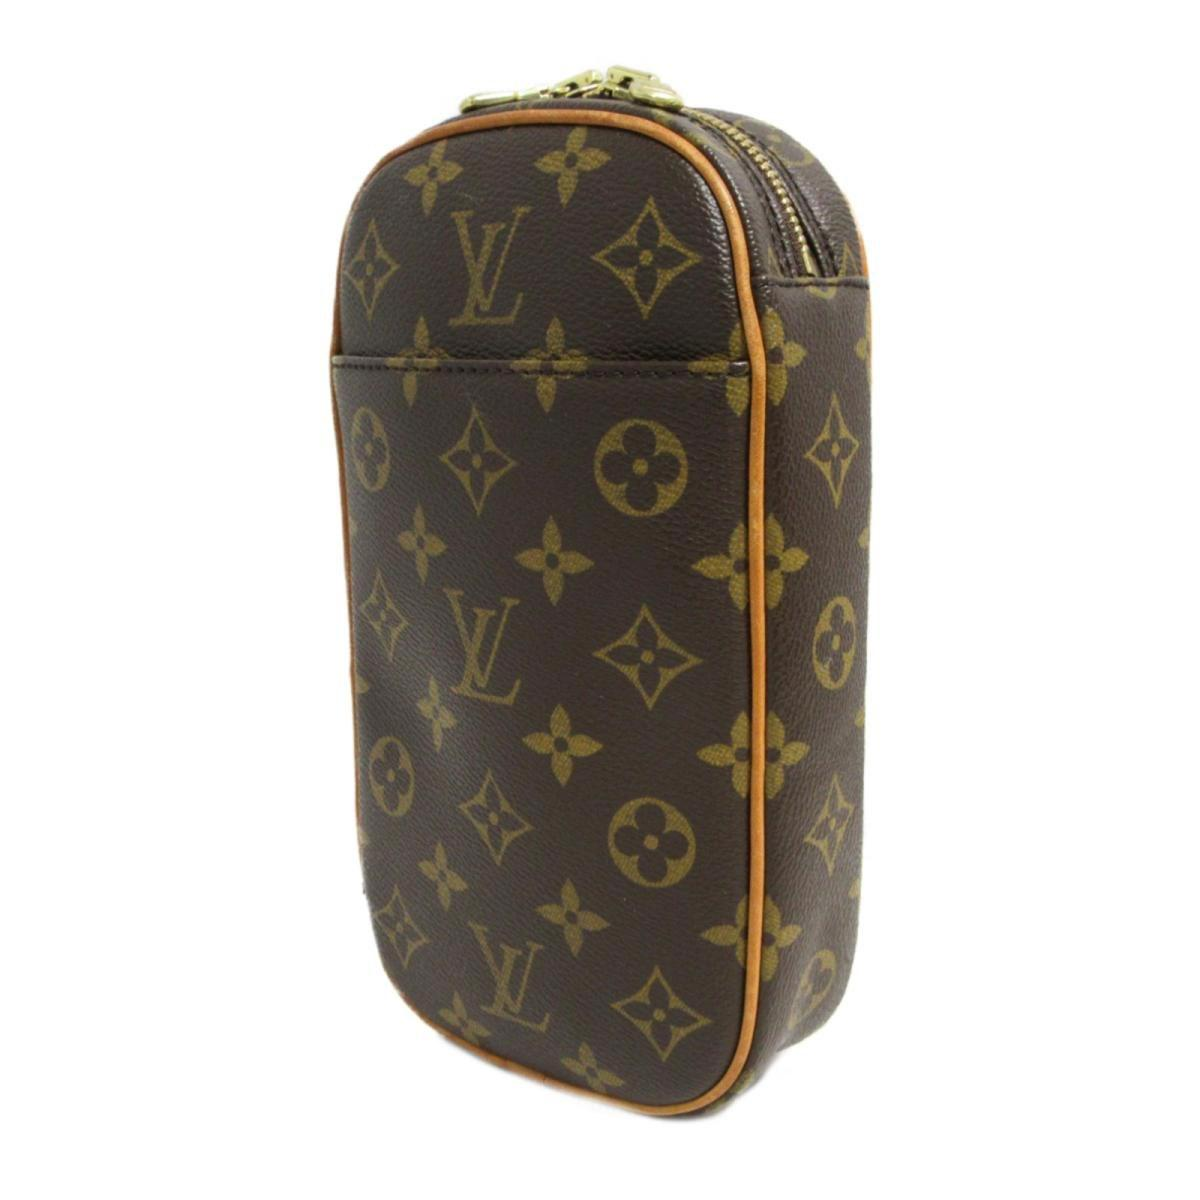 Lyst - Louis Vuitton Auth Pochette Ganjonwaist Bag M51870 Monogram ... 1b016b58fbc2f